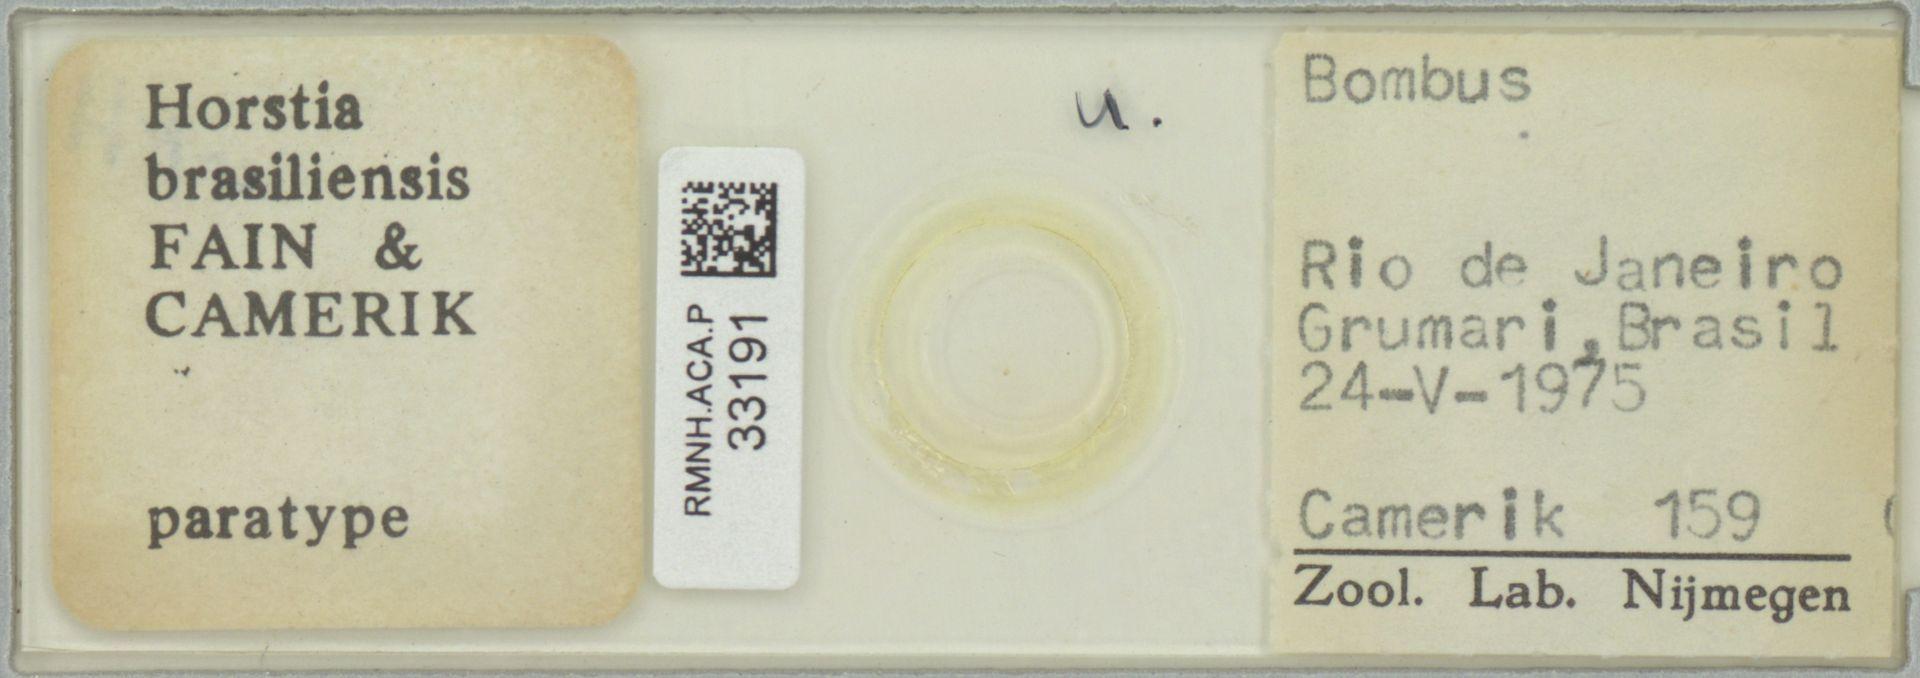 RMNH.ACA.P.33191 | Horstia brasiliensis Fain & Camerik